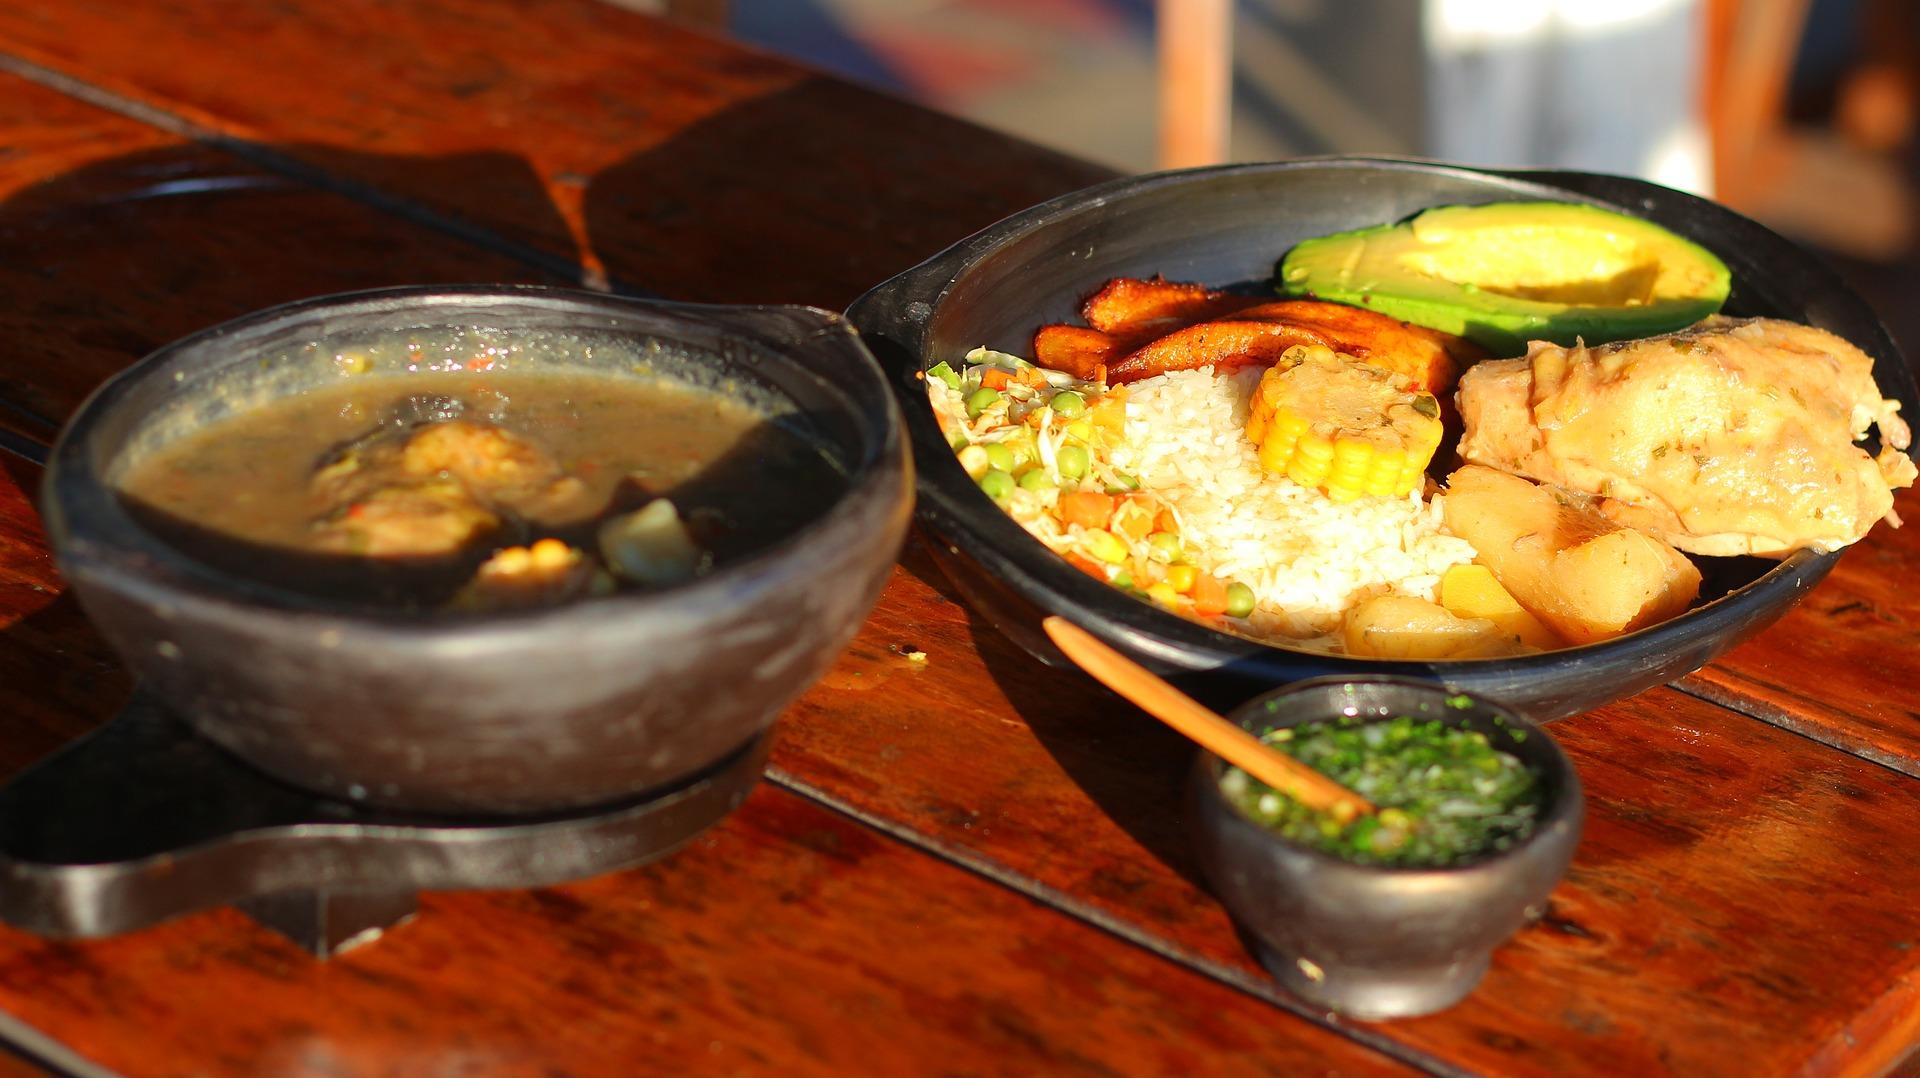 Medellin cuisine, Medellin City Guide